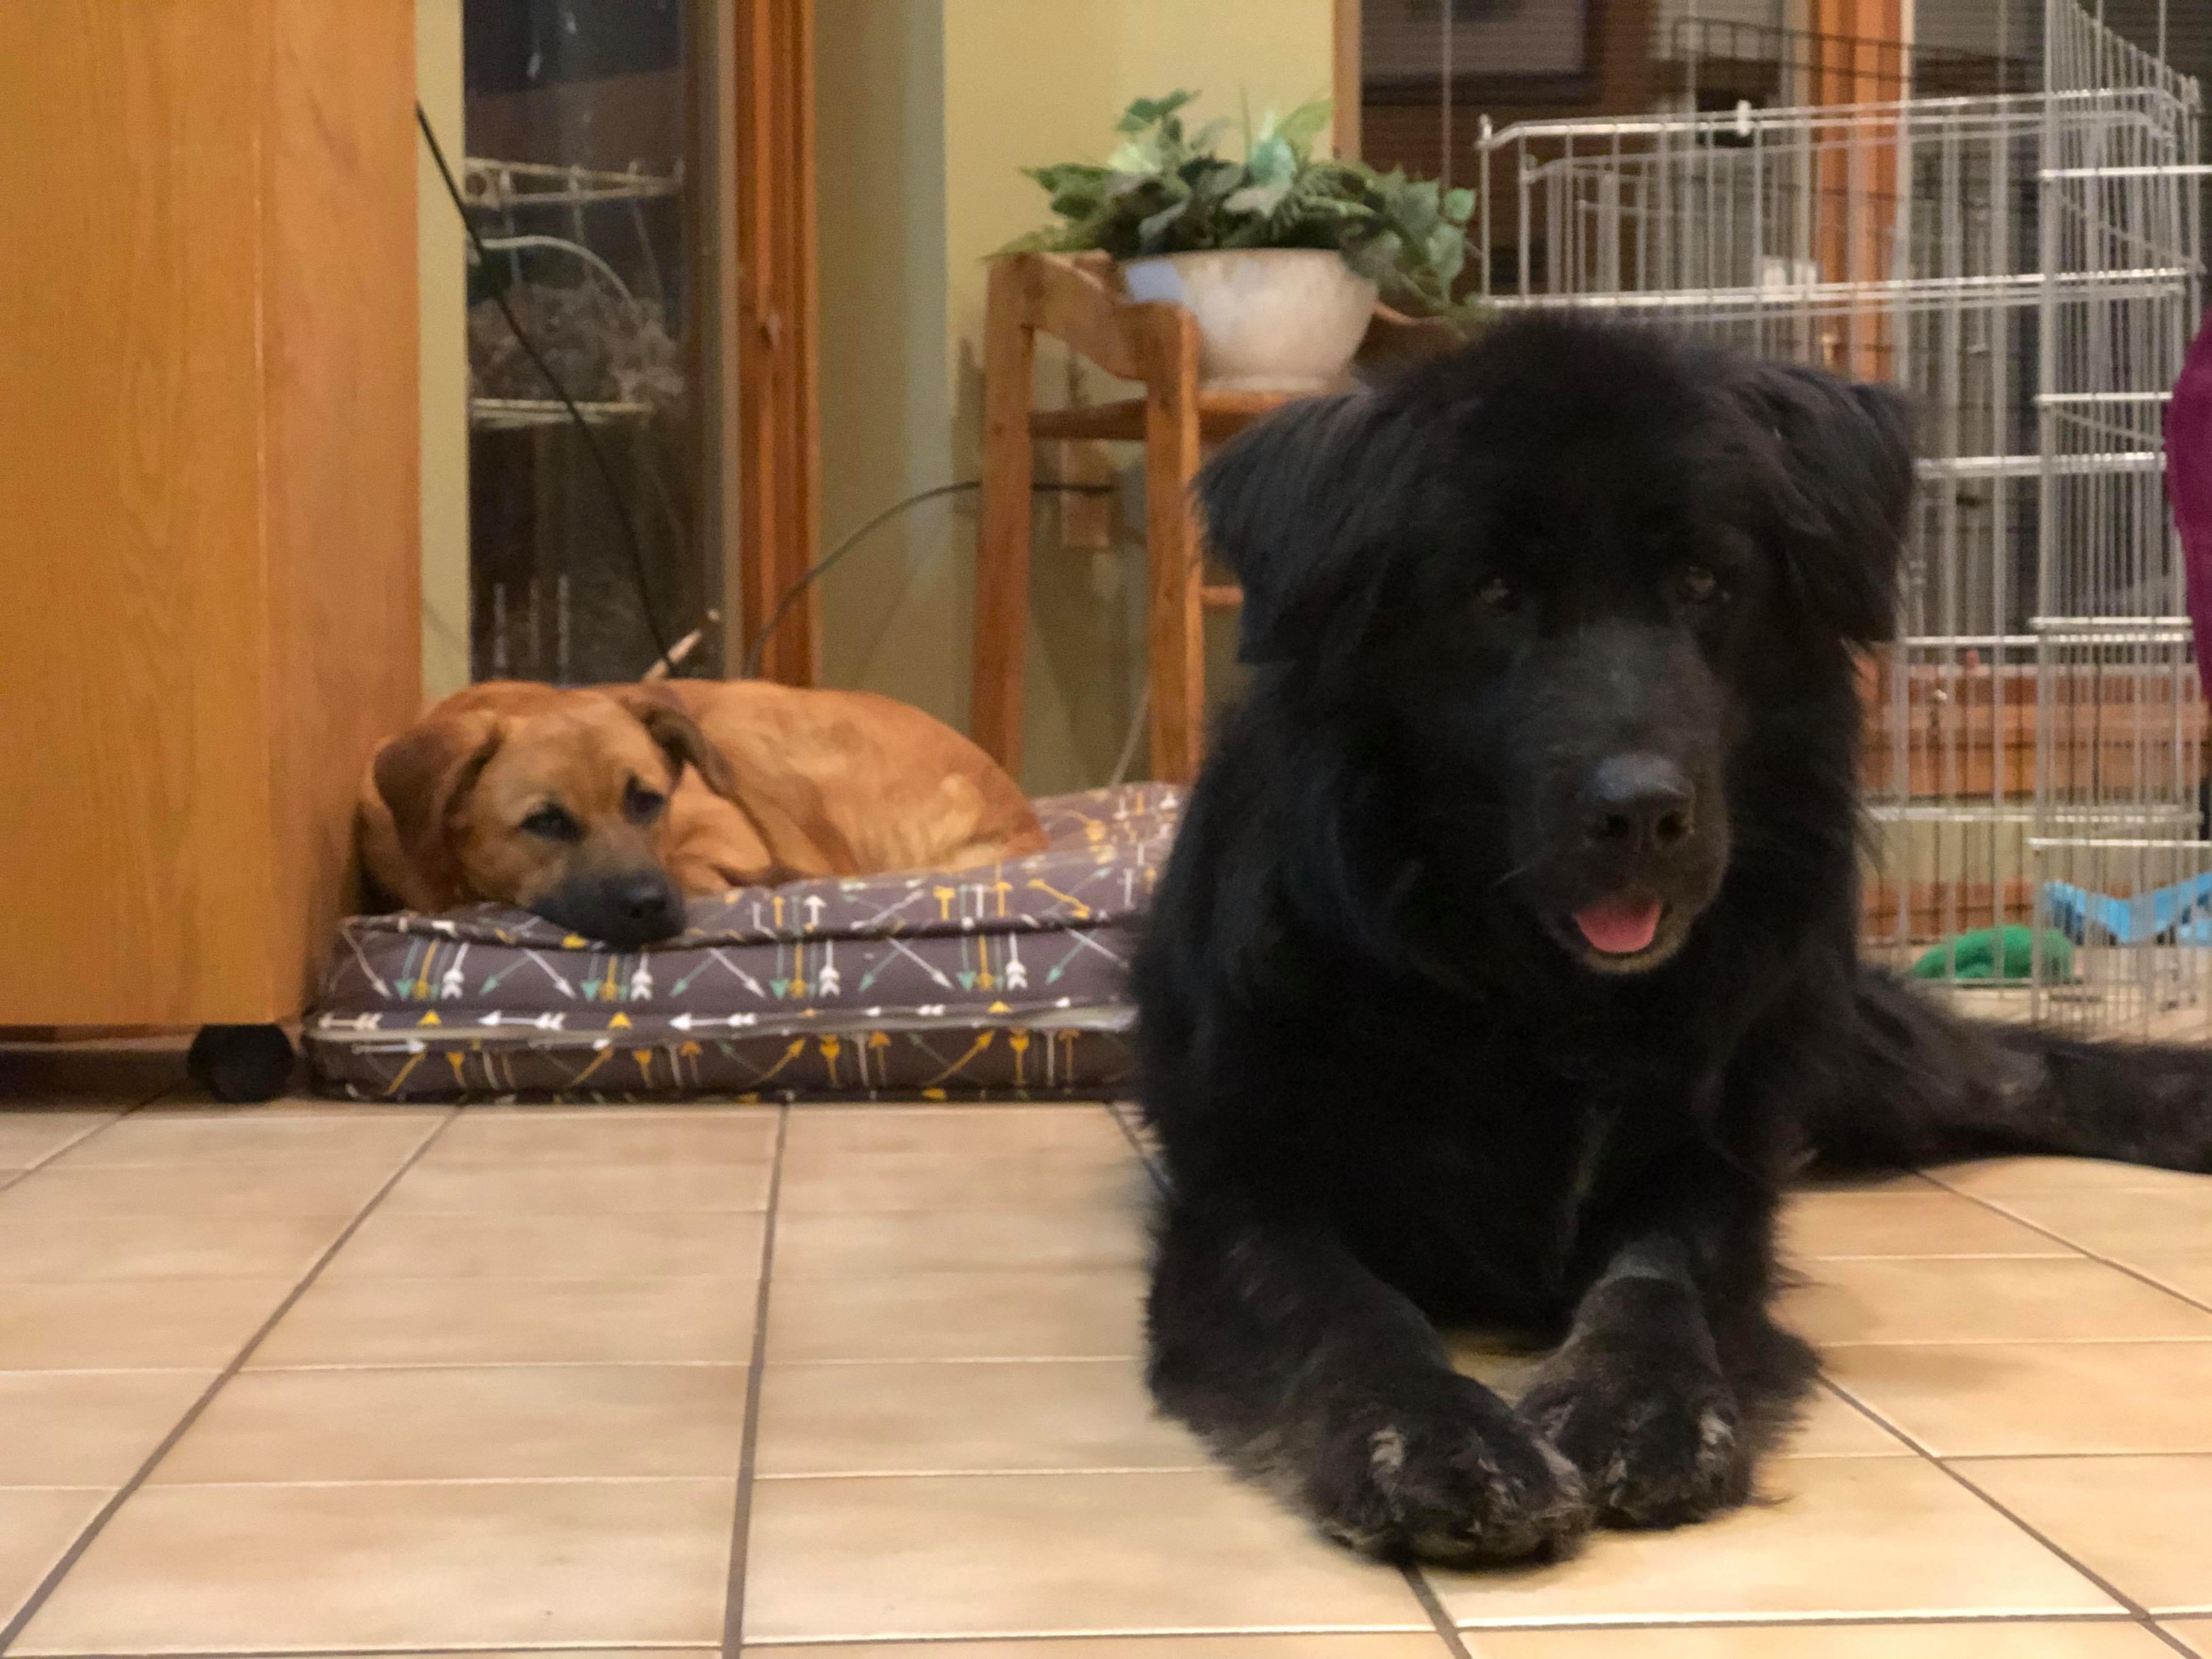 Houston and Biggie